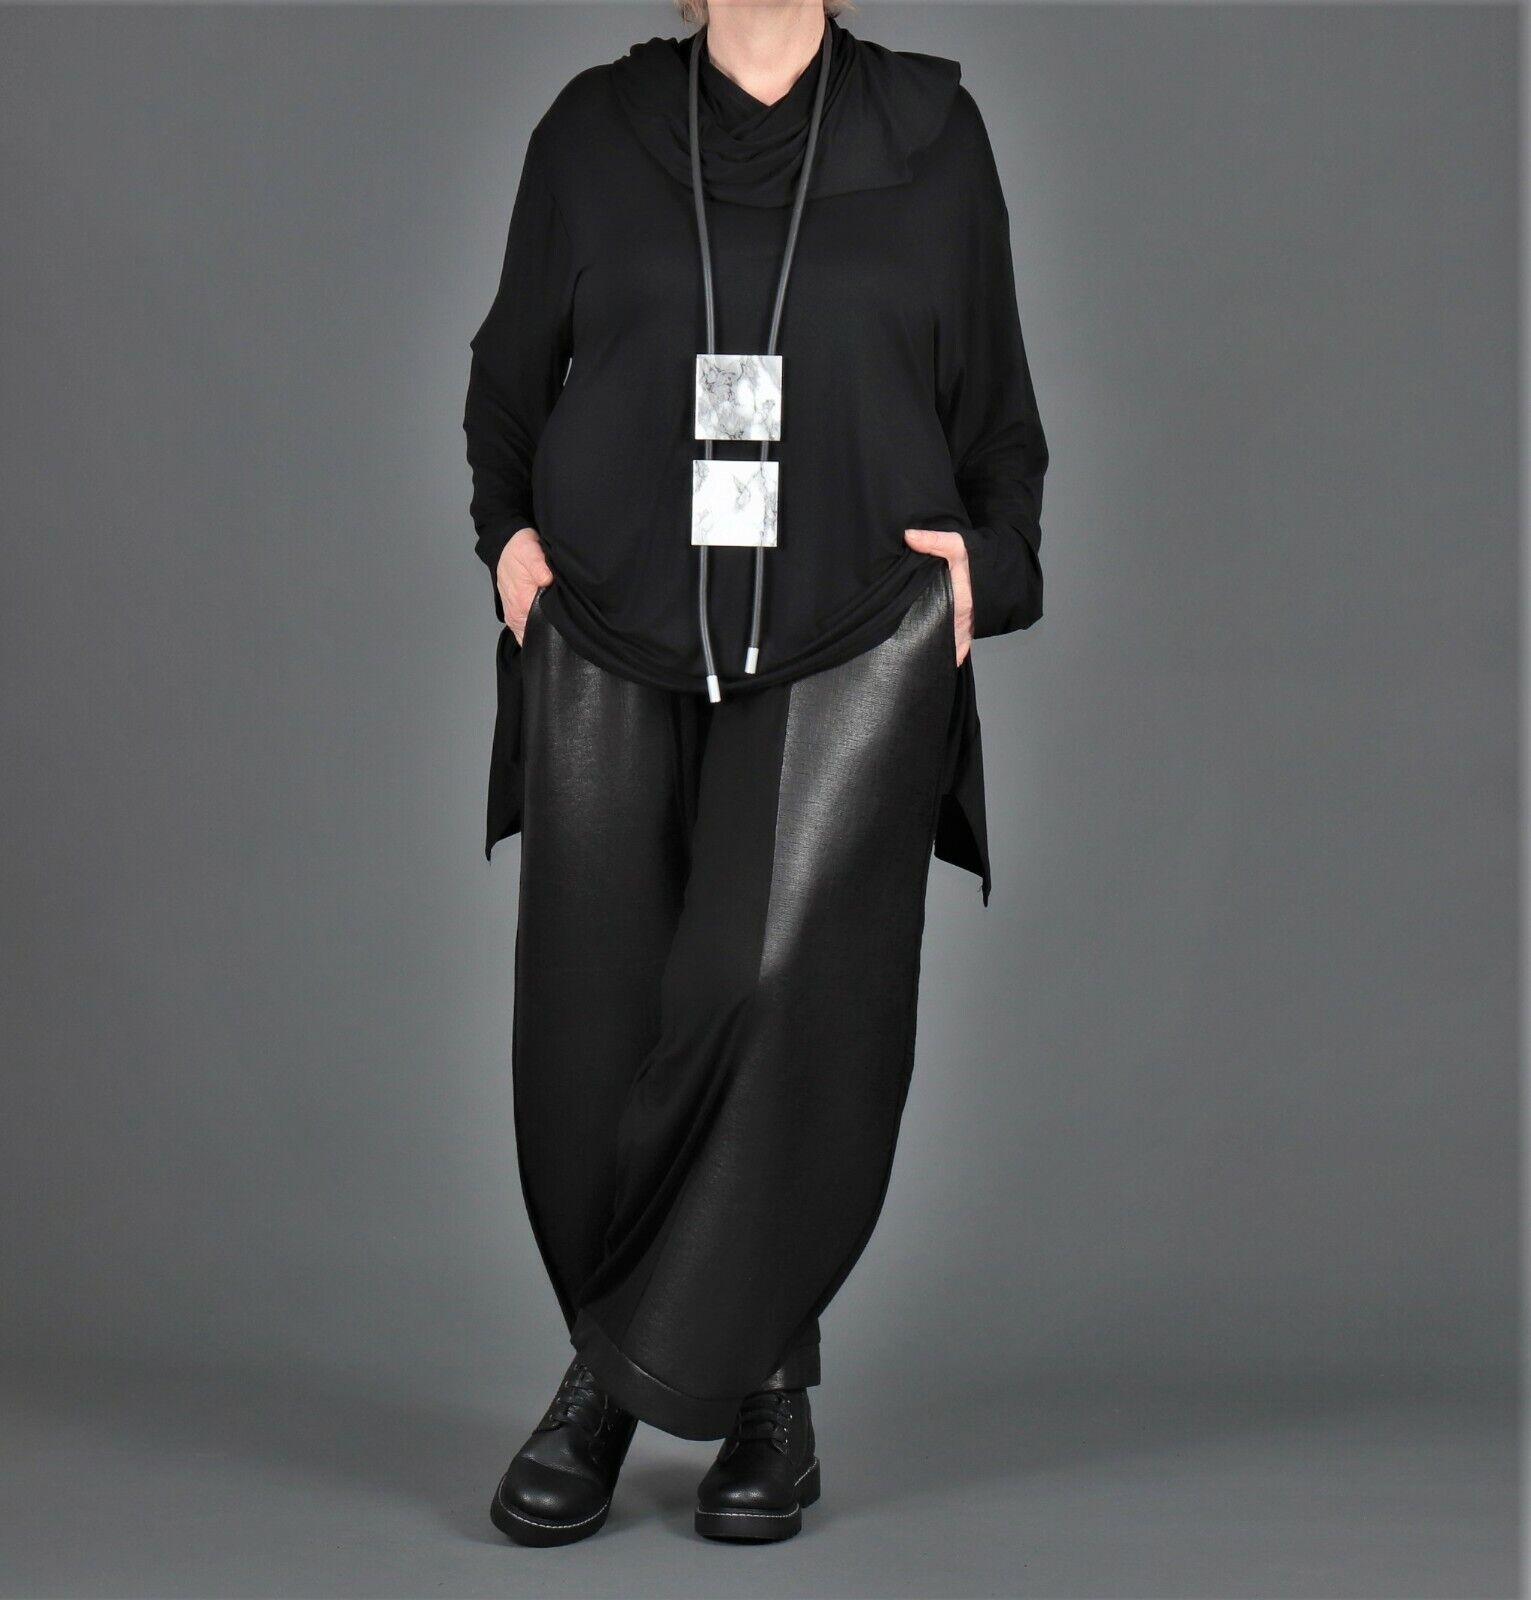 ♦ AKH Fashion Ballon-Hose EG 42,44,46,48,50,52 schwarz, Kunstleder ♦